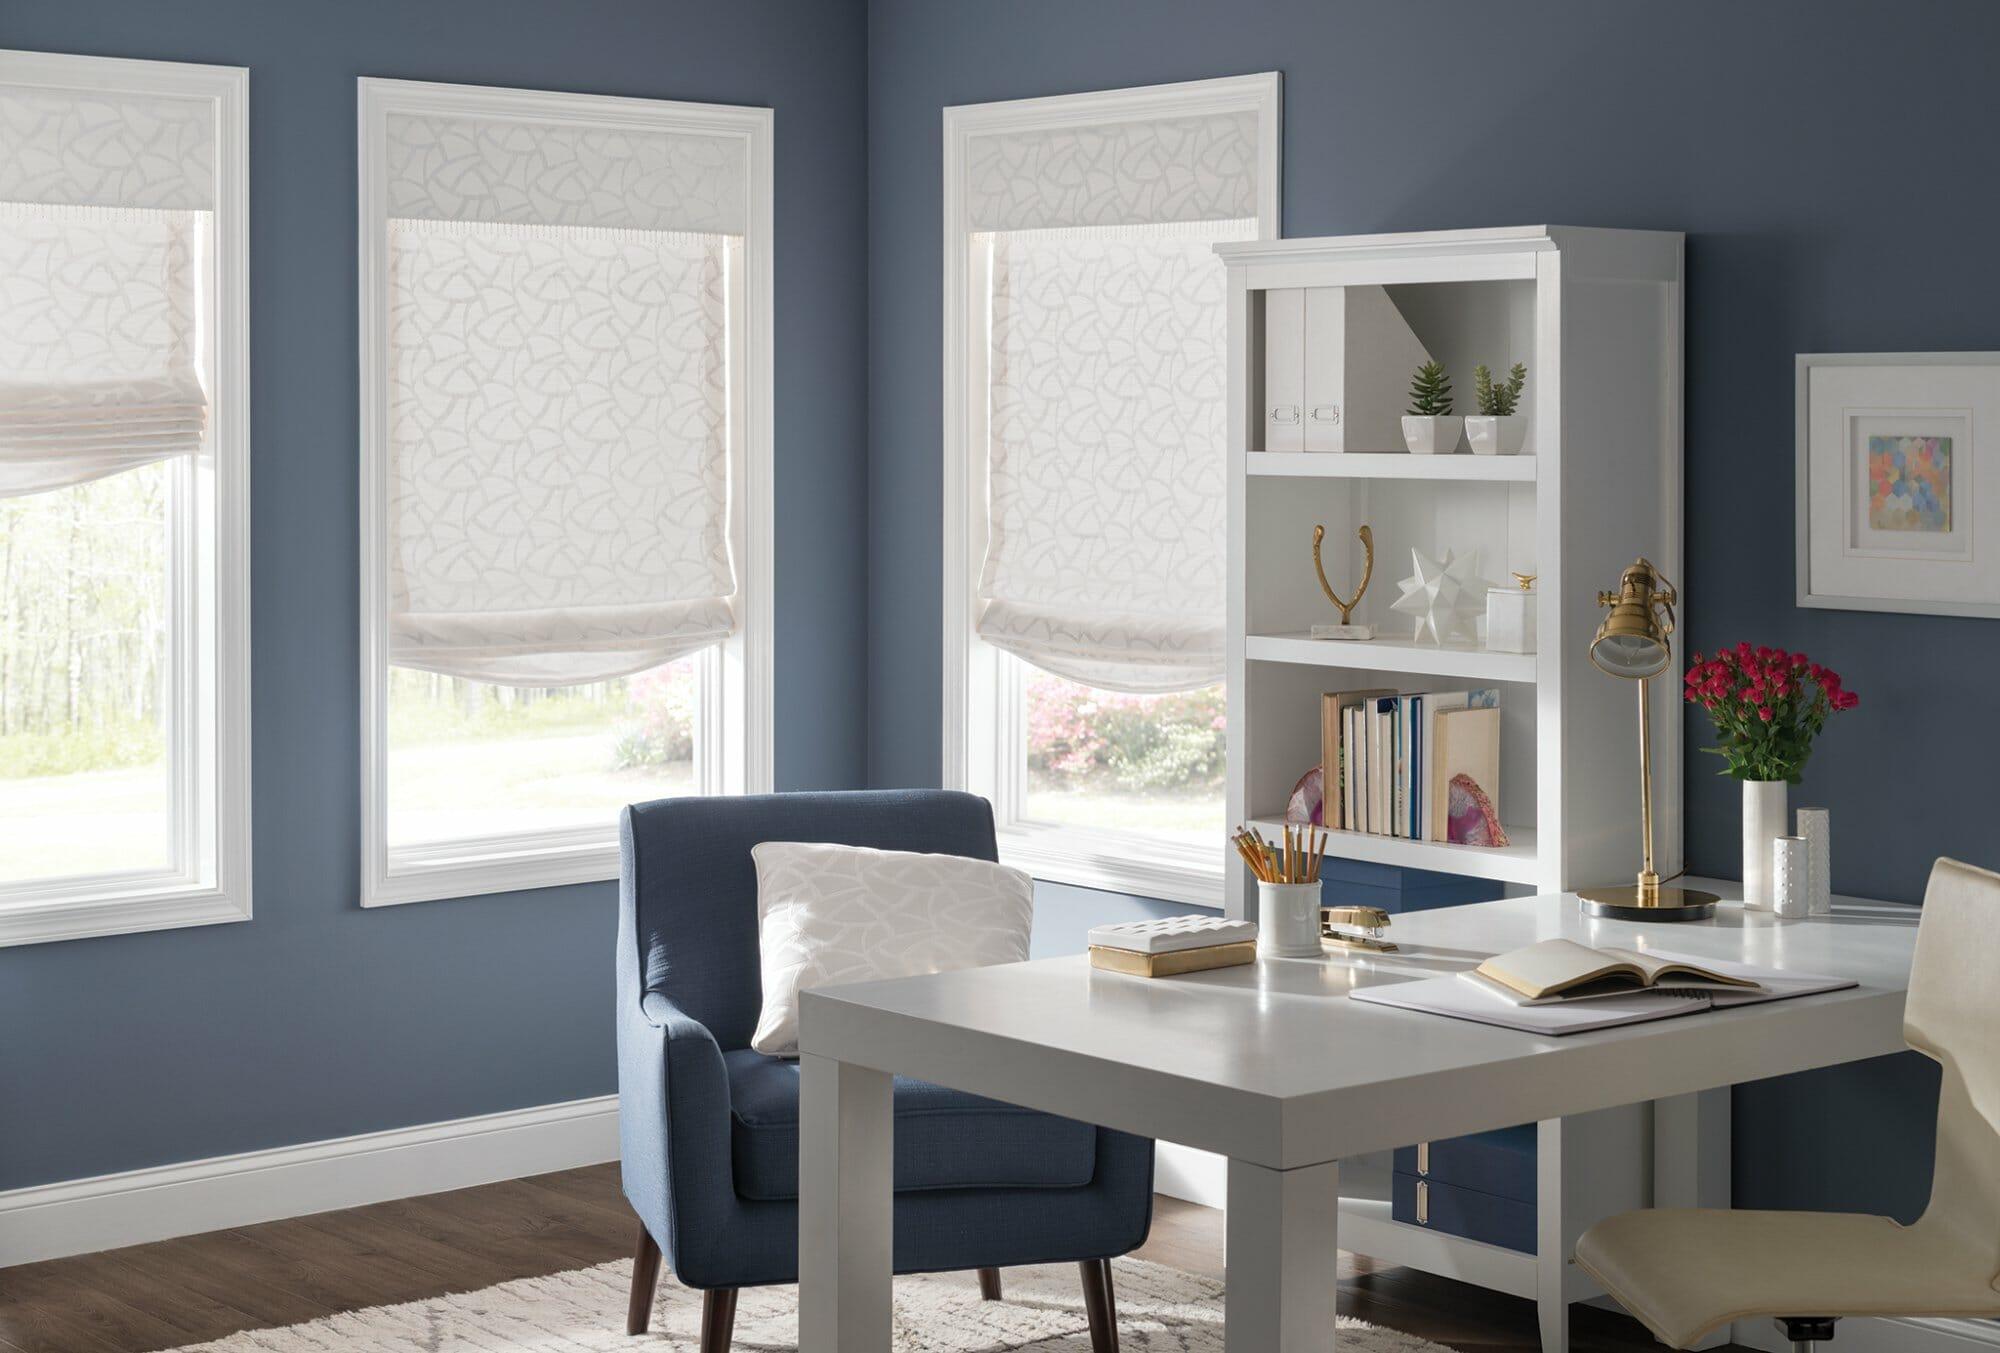 Home Office Window Treatments California 3 Blind Mice